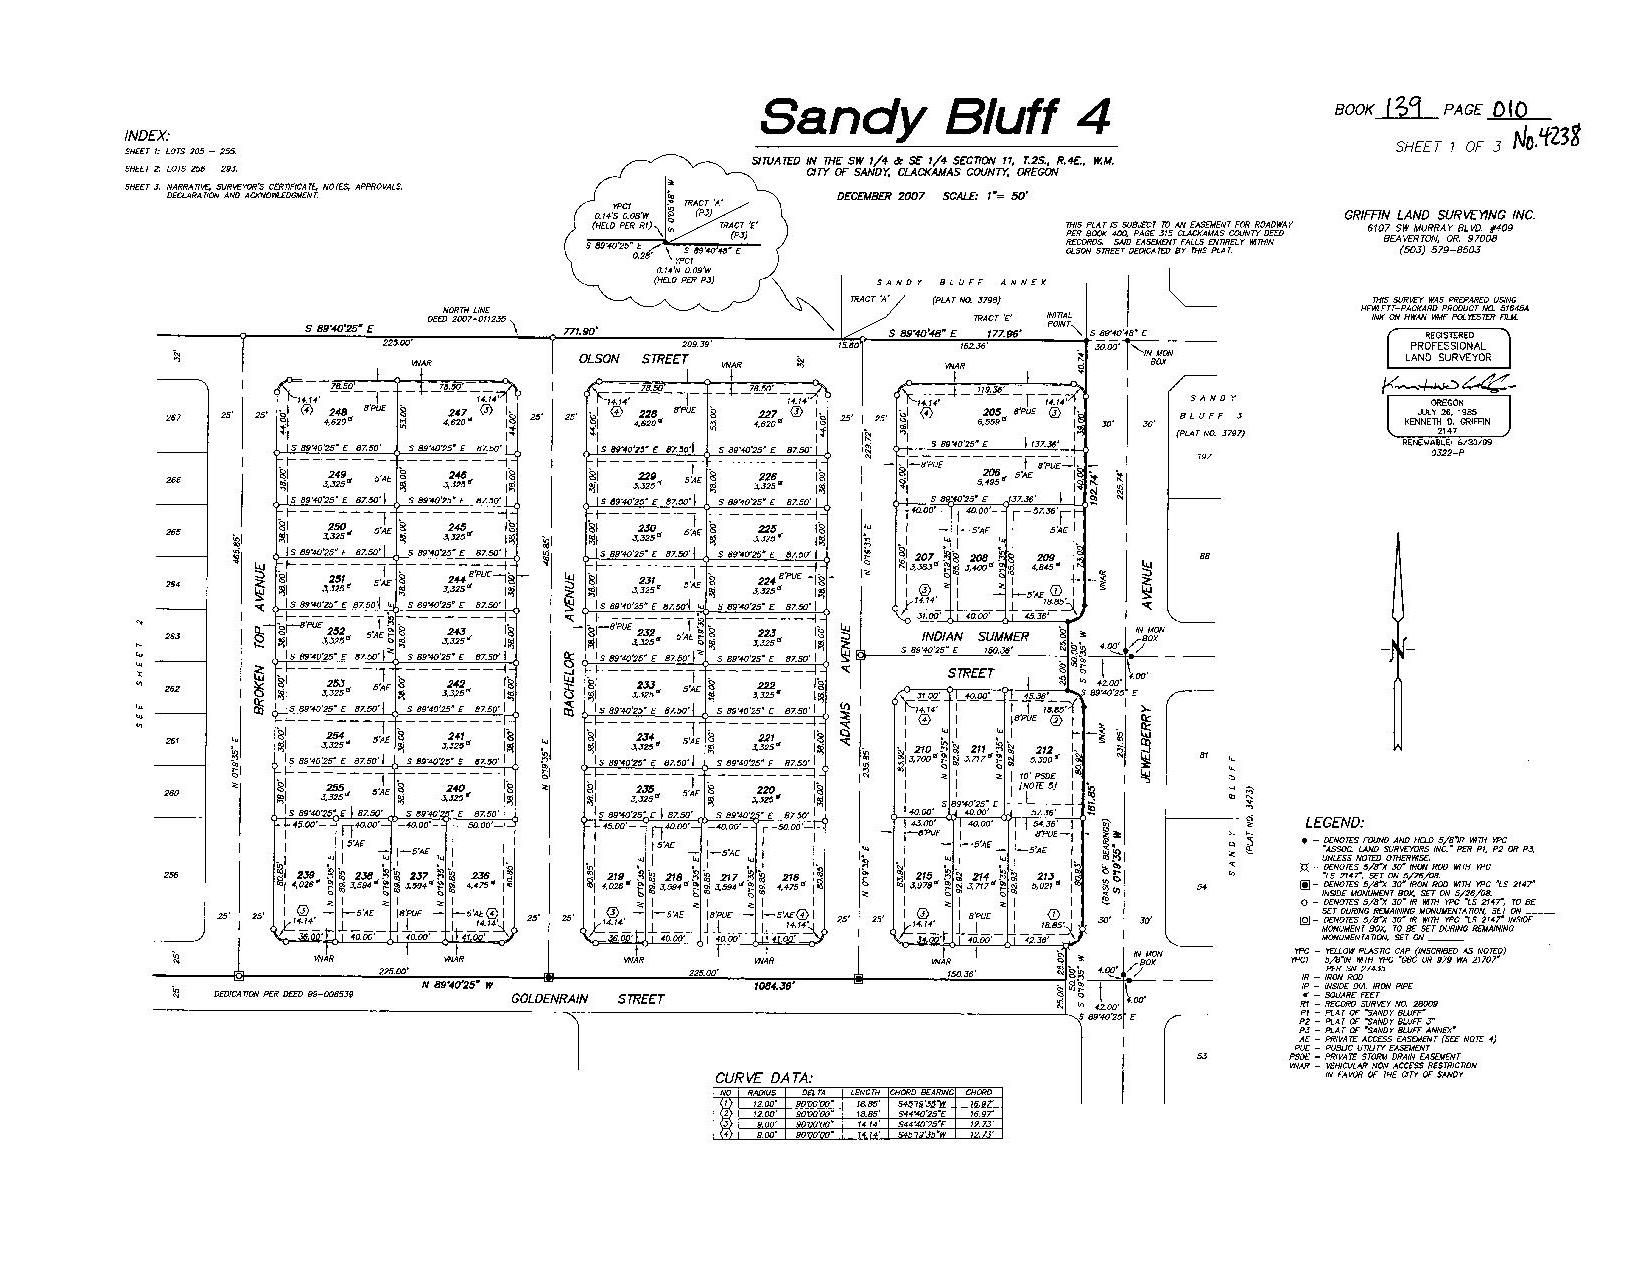 Plat-pic-Sandy-Bluff13.jpg